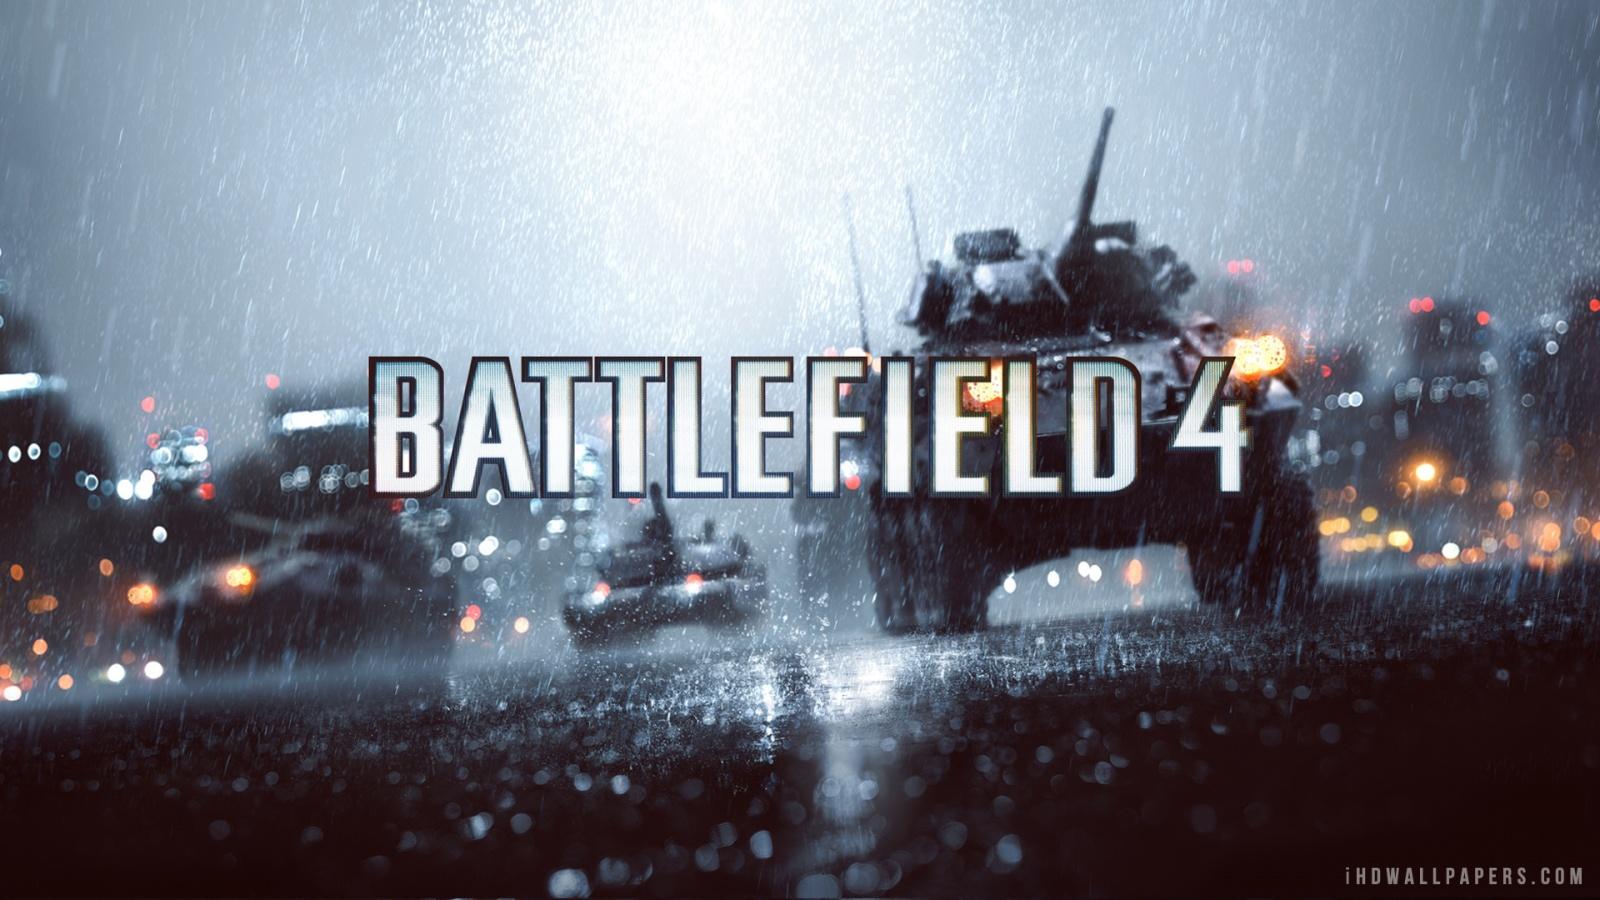 Battlefield 4 Wallpapers HD 2040X1140 - WallpaperSafari